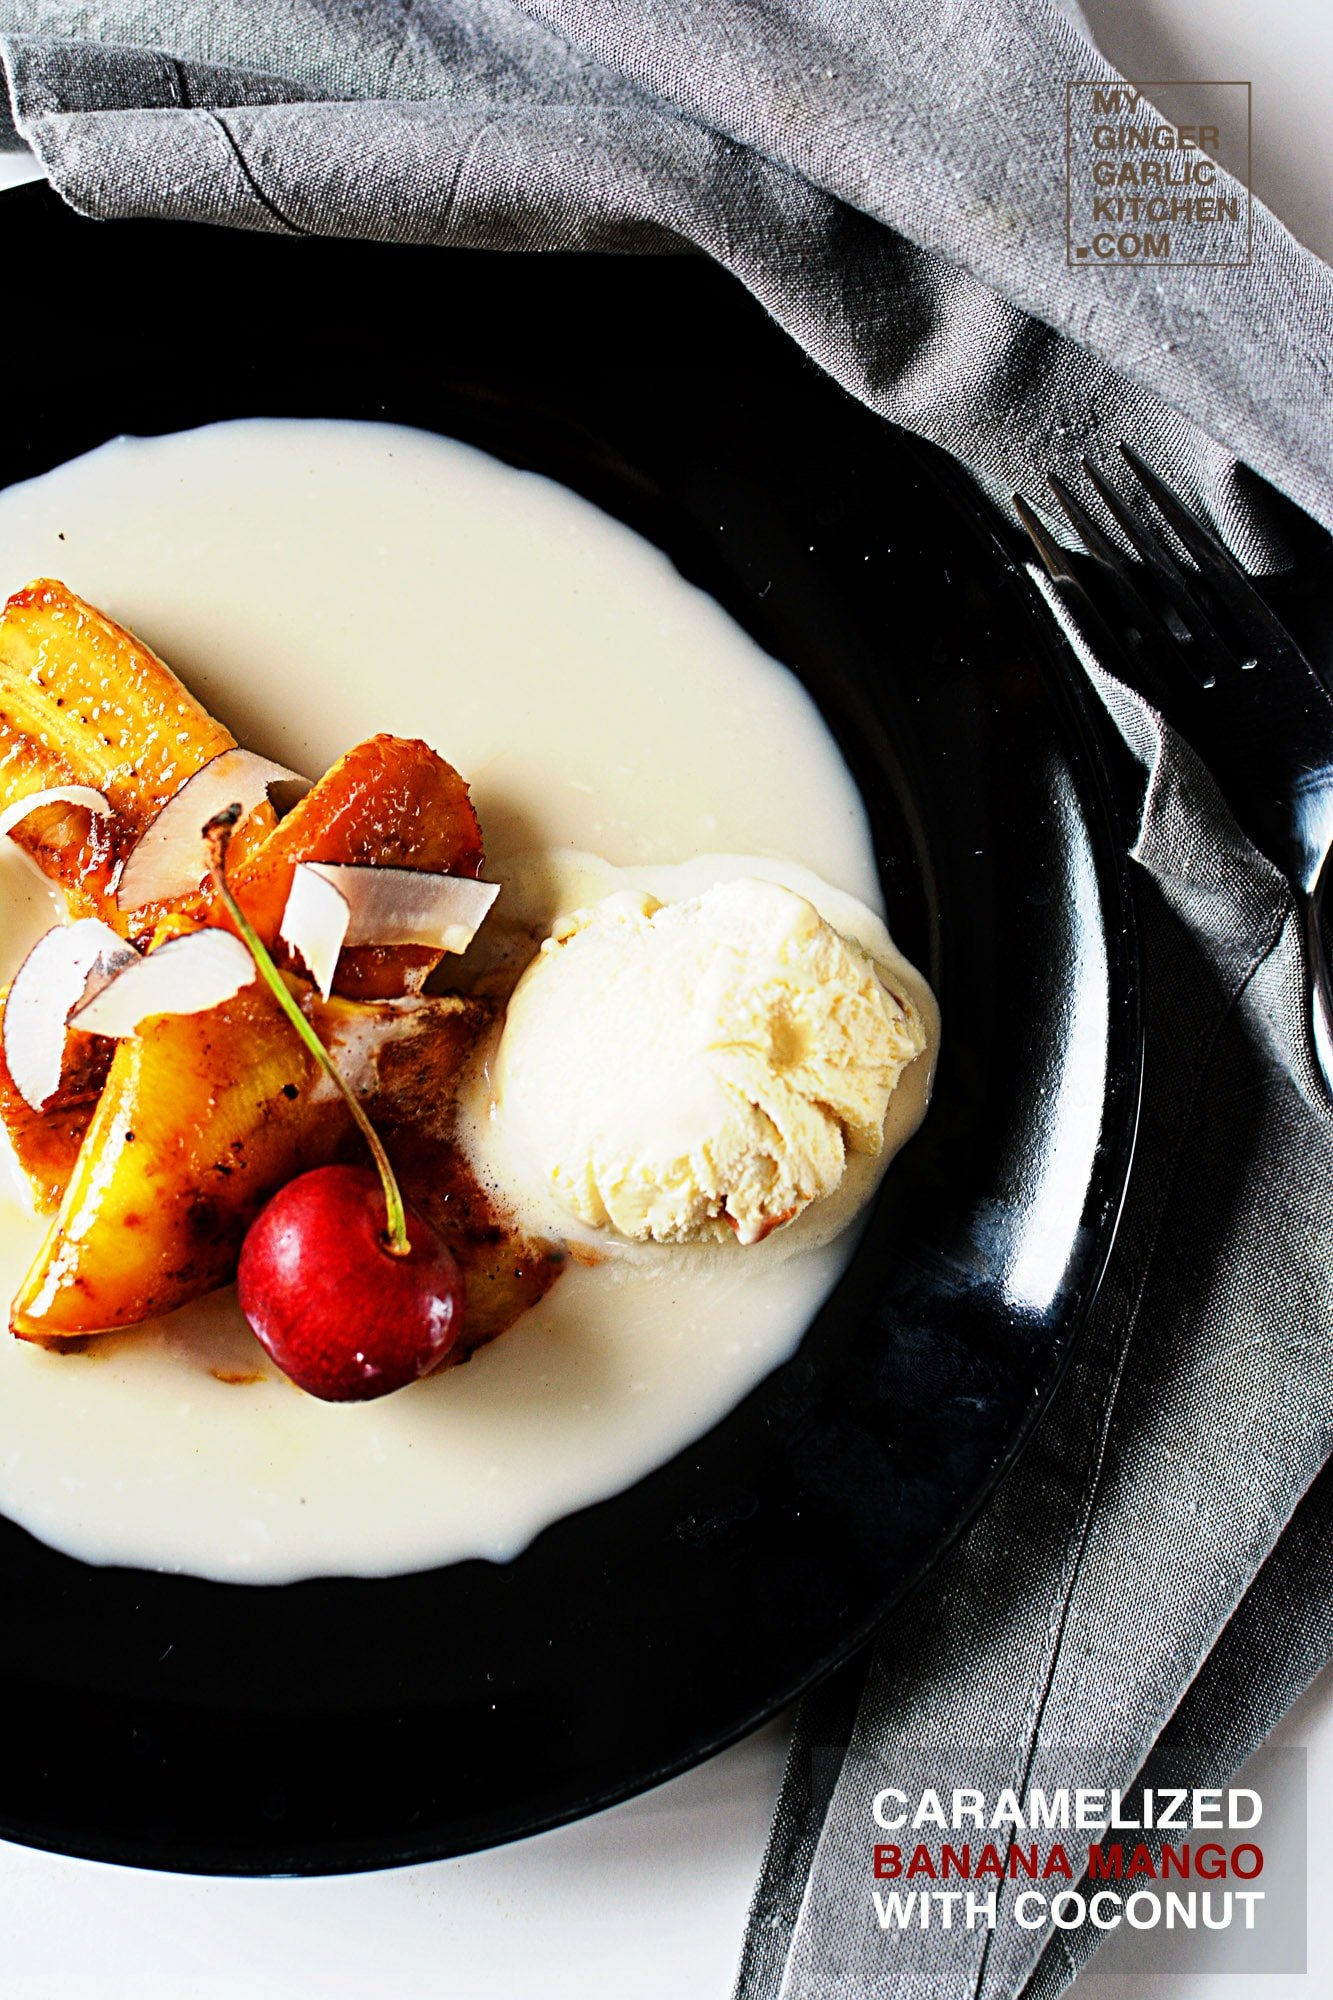 Image - recipe caramelized banana mango with coconut anupama paliwal my ginger garlic kitchen 5